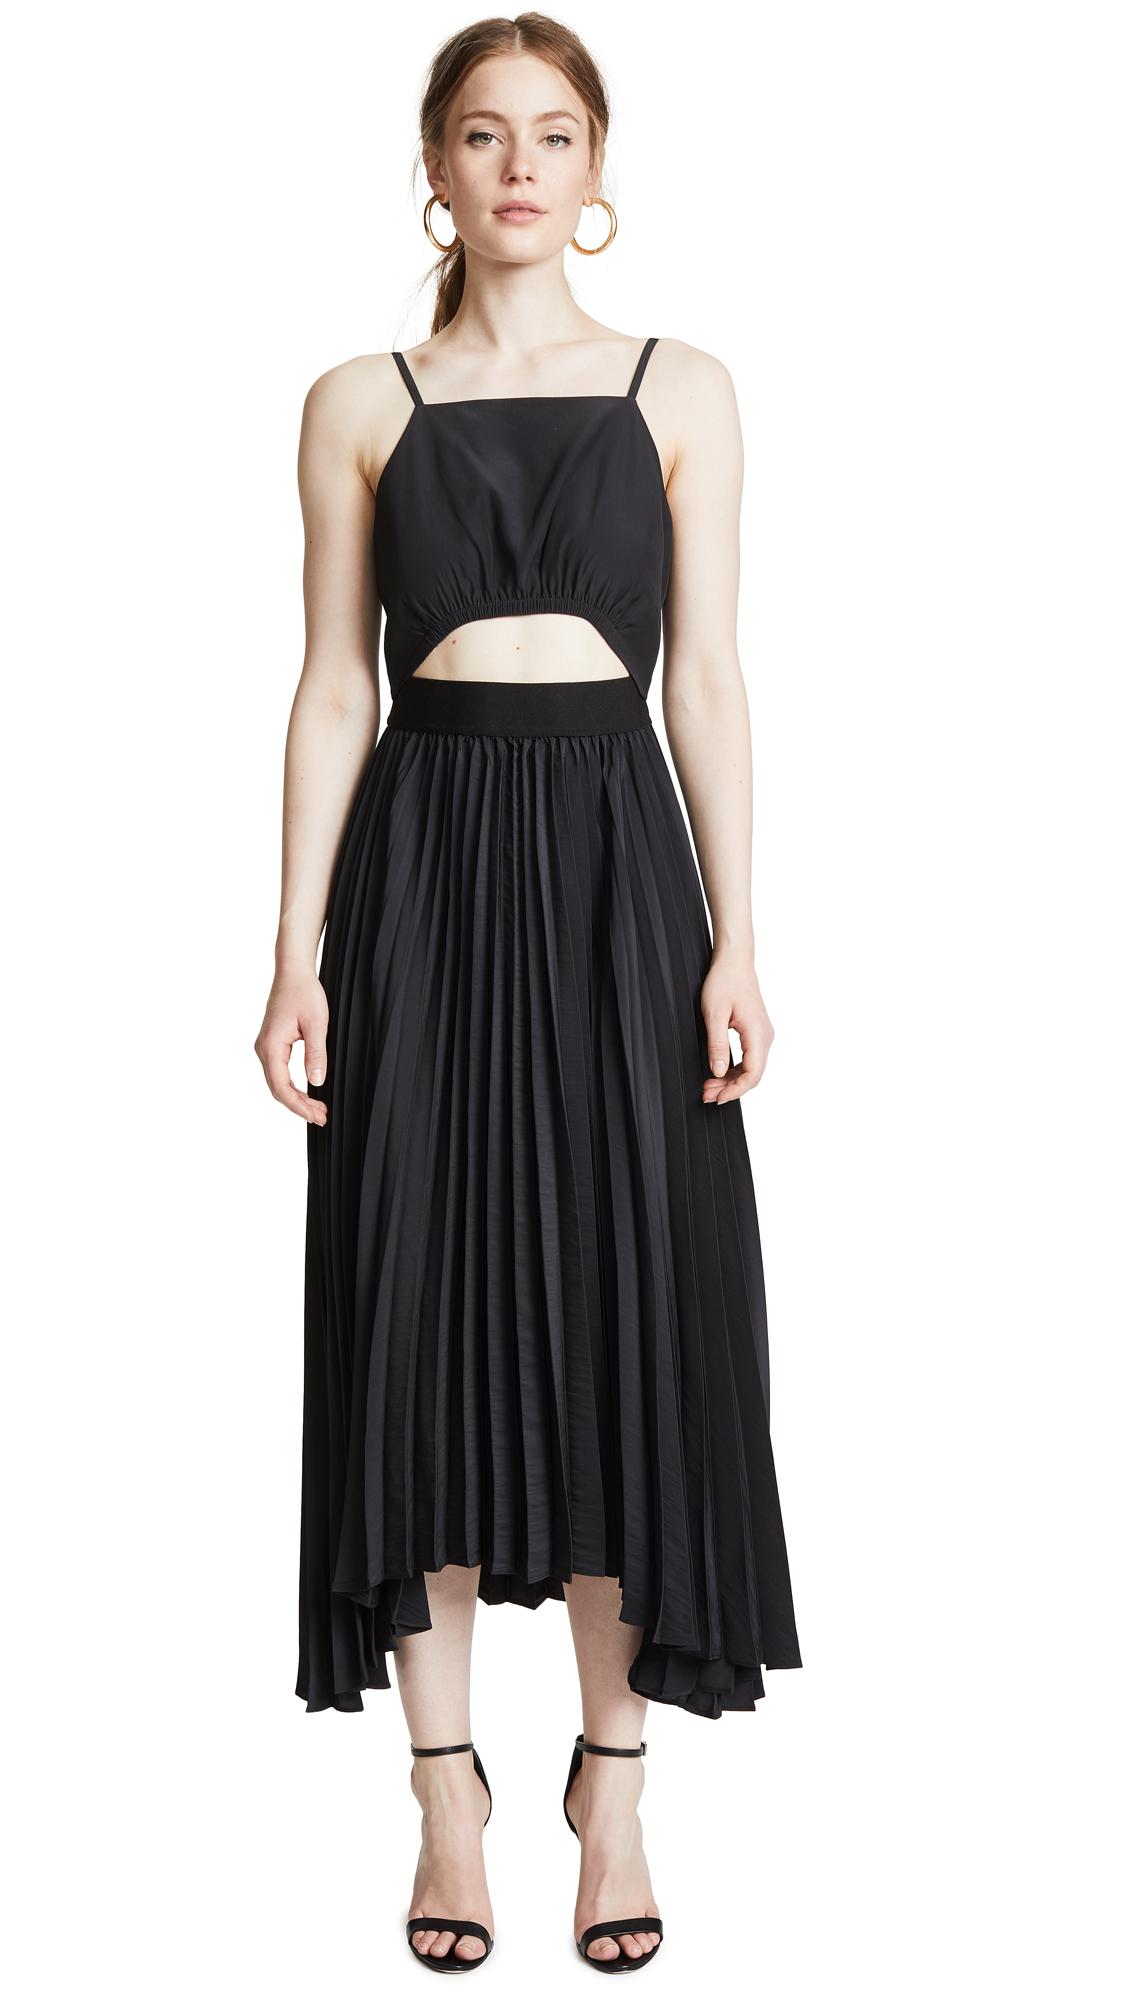 Ramy Brook Jillian Dress - Black